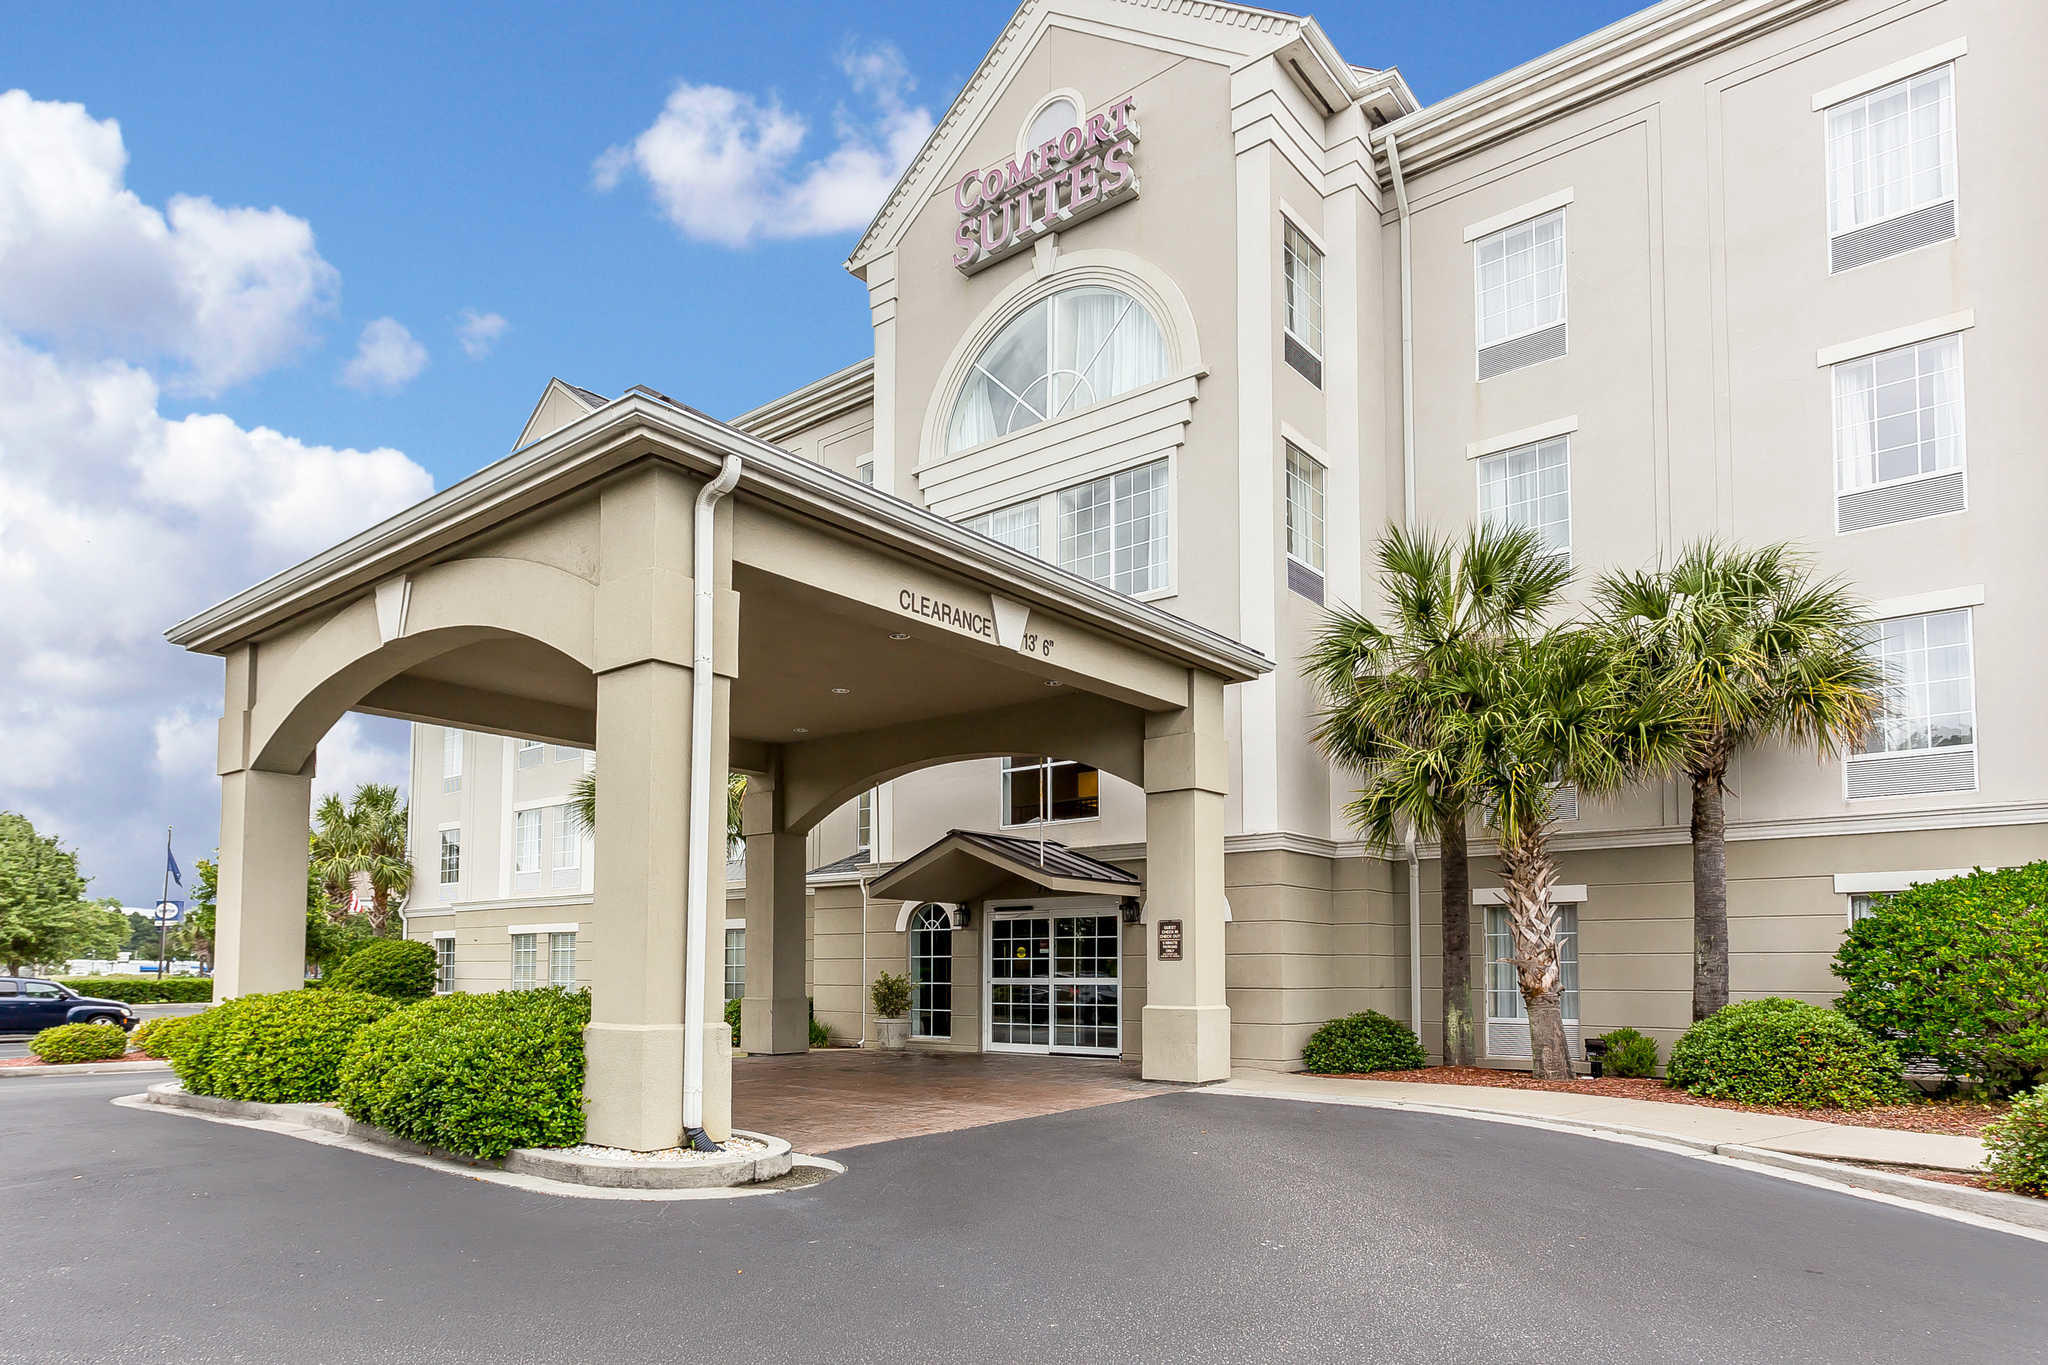 Pet Friendly Hotels Near Myrtle Beach Convention Center